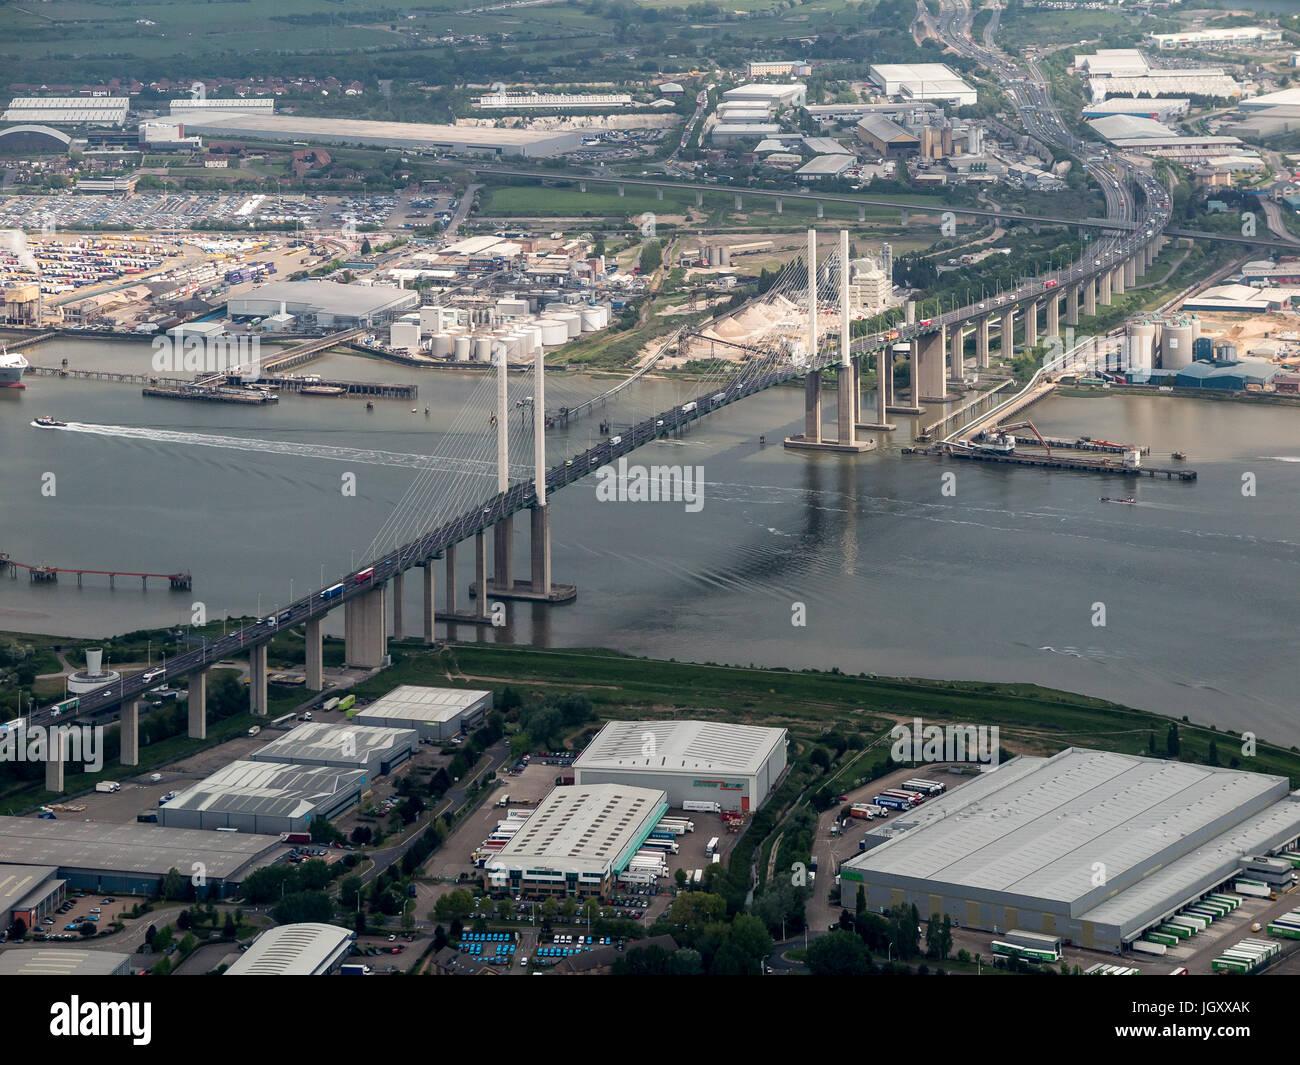 Aerial view of Queen Elizabeth 2 Bridge Dartford Kent England UK - Stock Image